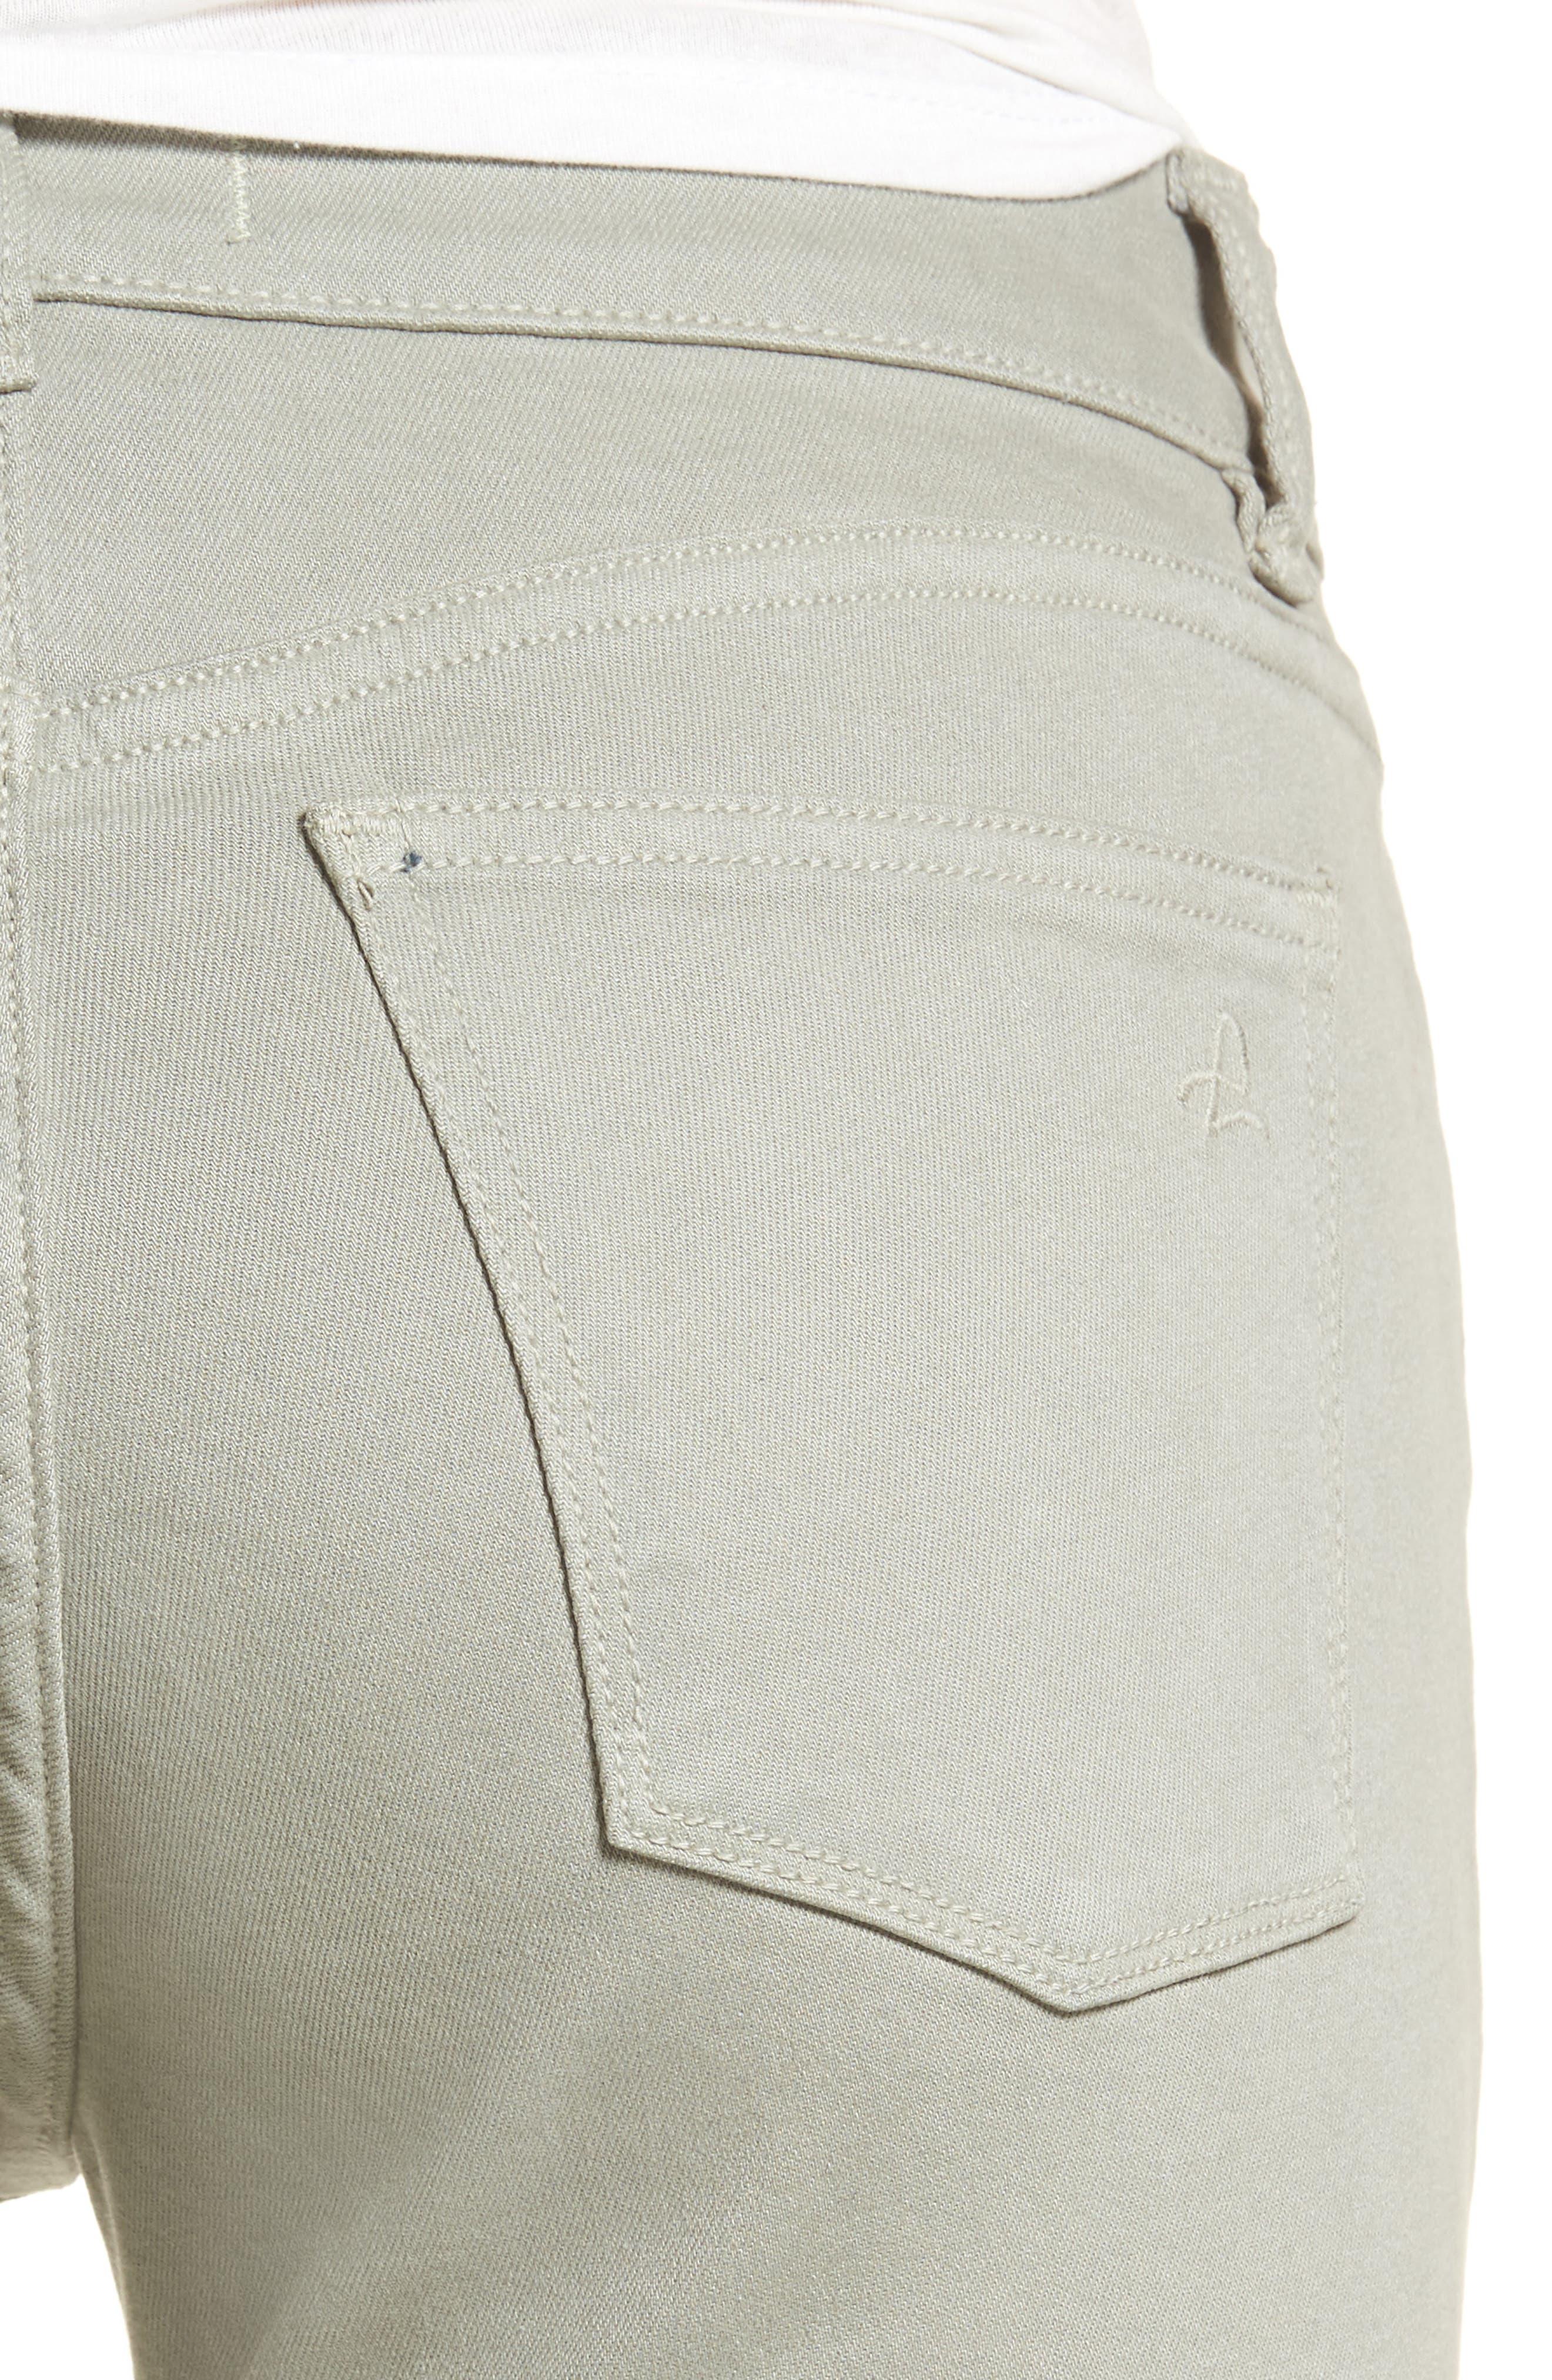 Florence Instasculpt Crop Skinny Jeans,                             Alternate thumbnail 4, color,                             410